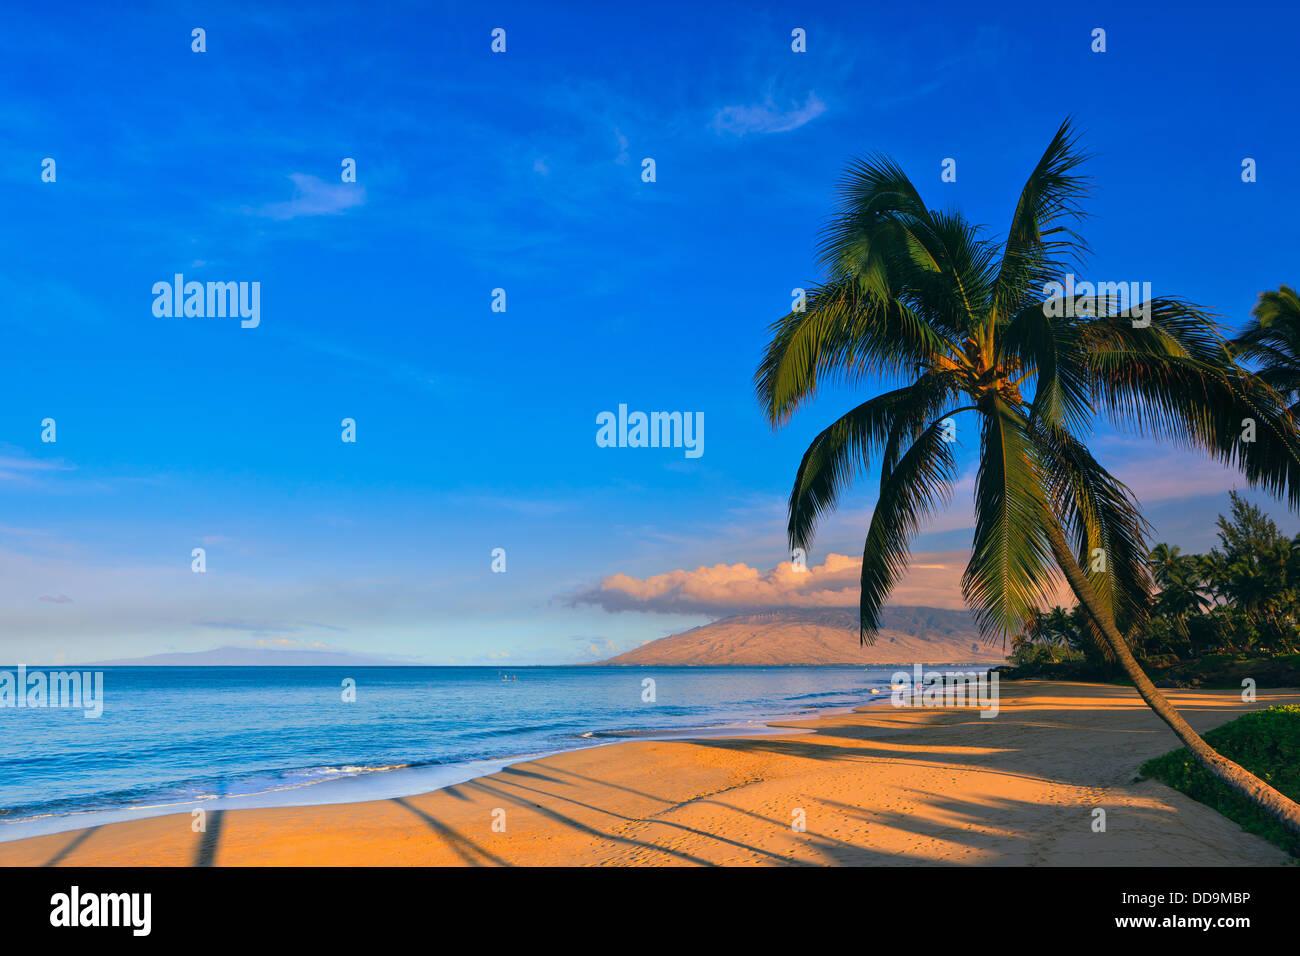 Lever du soleil à Kamaole Beach Park, Kihei, Maui, Hawaï Photo Stock